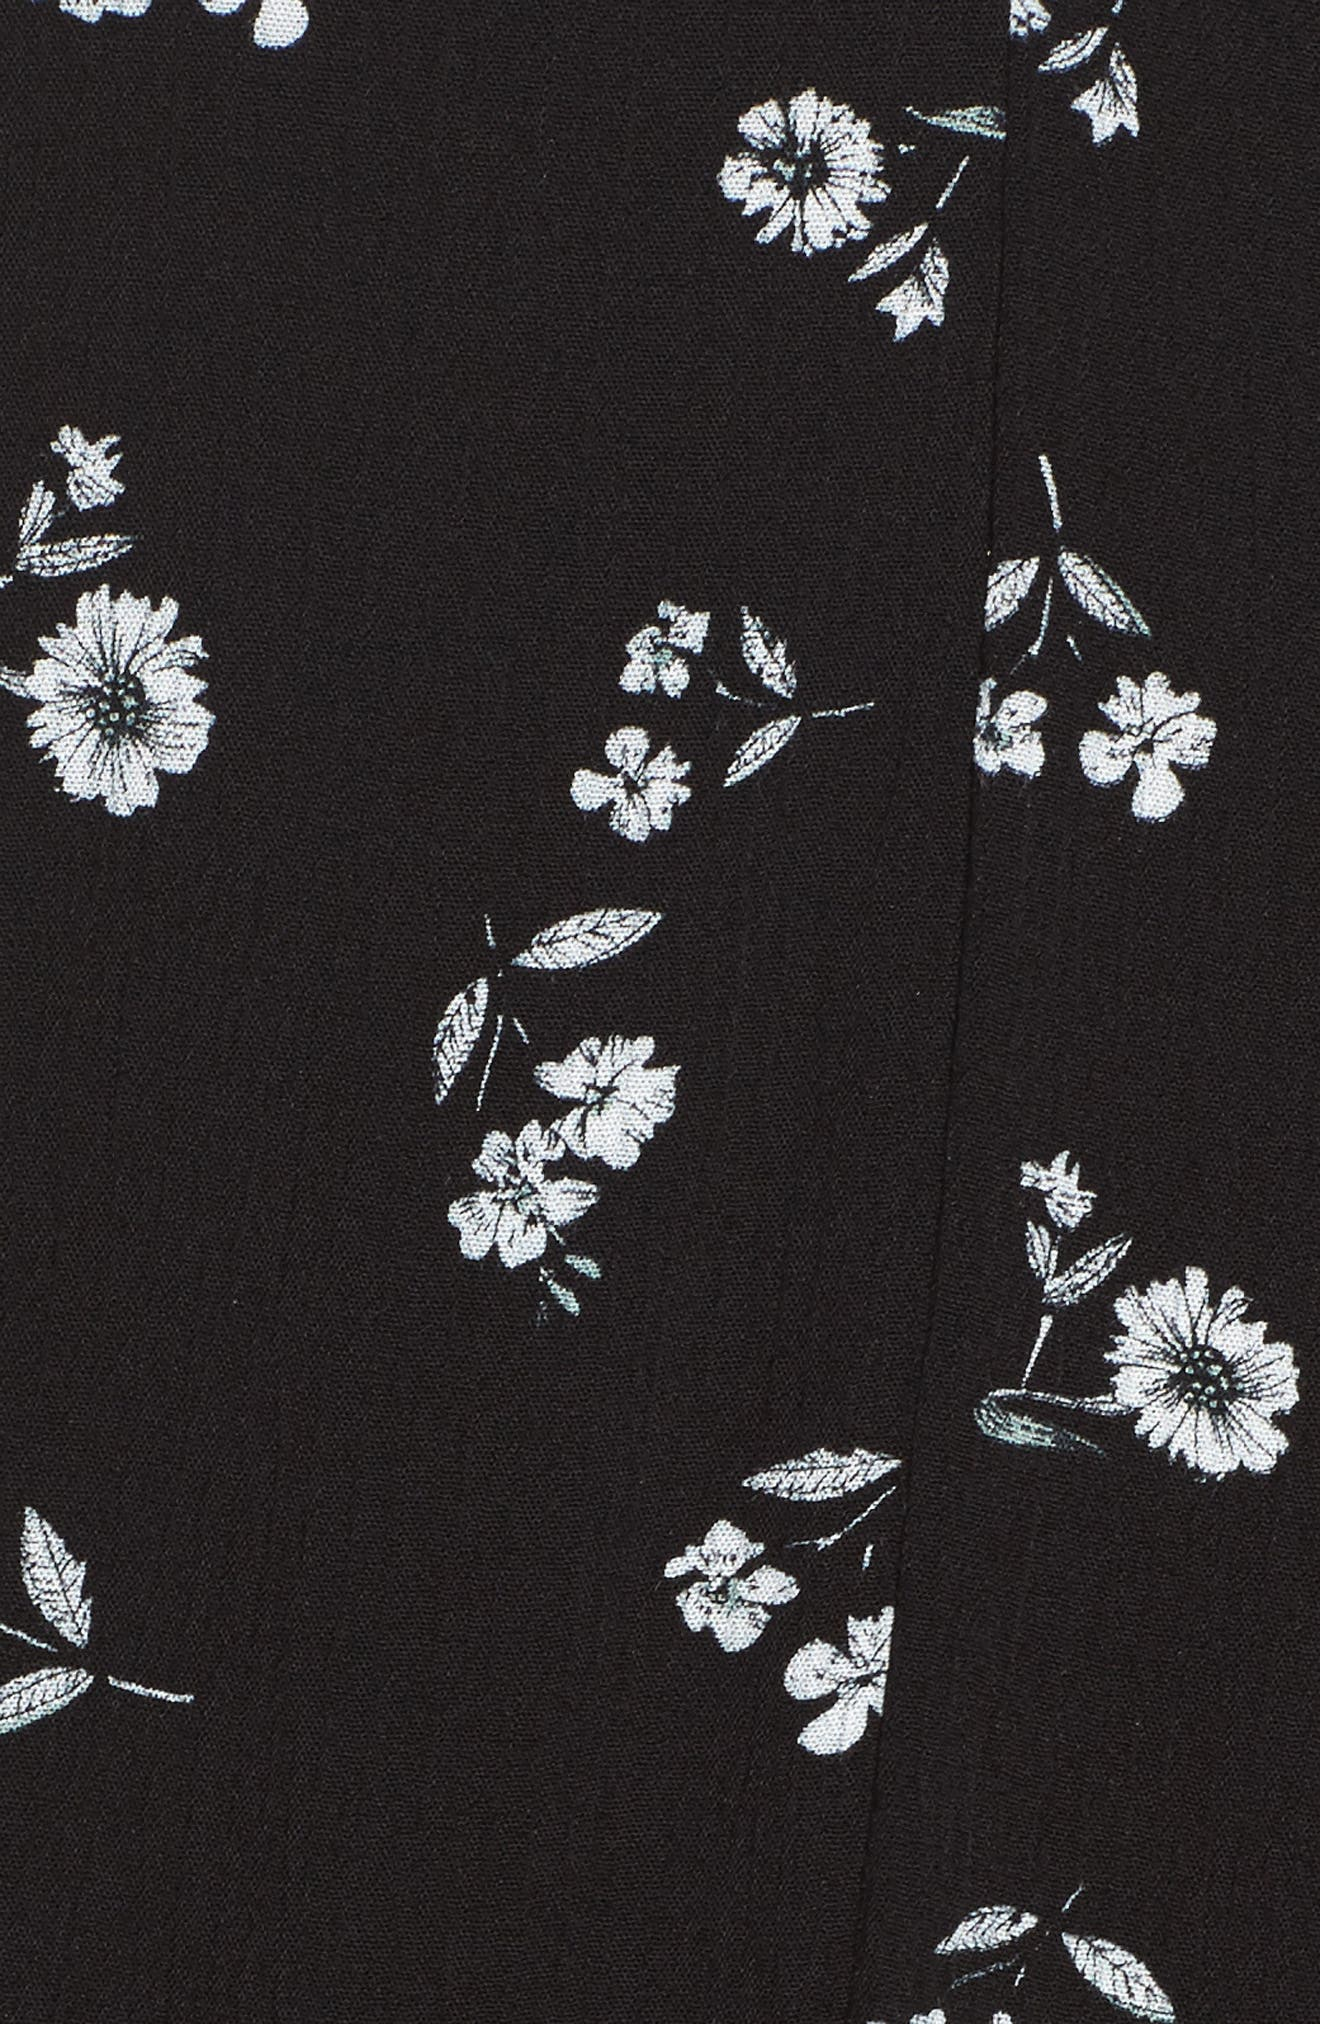 Bell Sleeve Floral Shift Dress,                             Alternate thumbnail 5, color,                             Black White Daisy